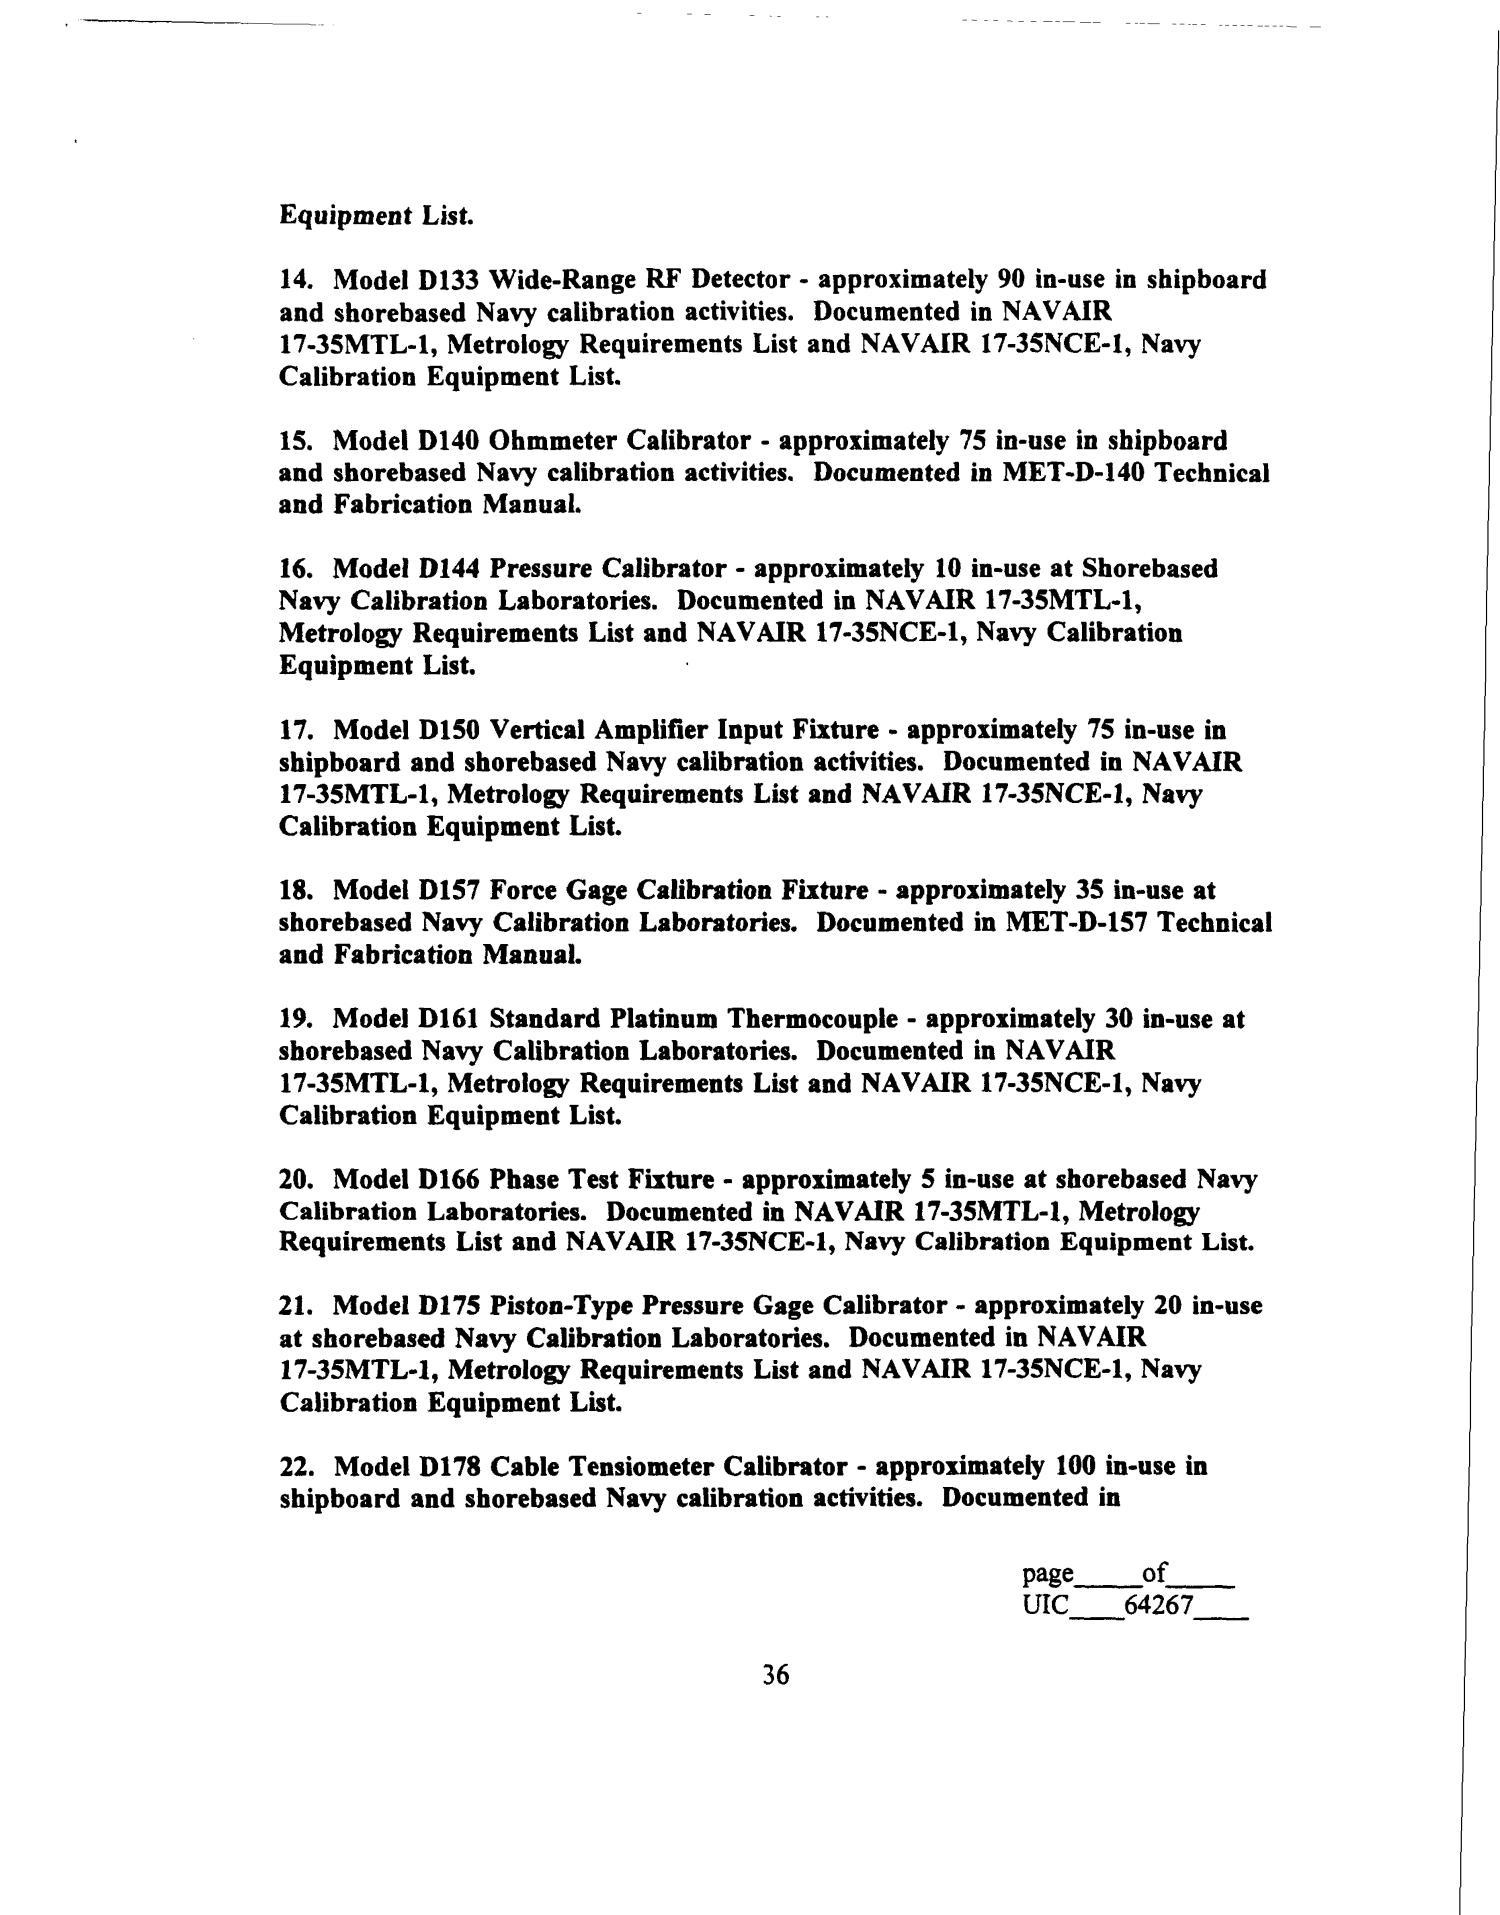 naval warfare assessment division corona ca analysis 2 of 4 rh digital library unt edu Navy Technical Maintenance Manual Naval Ships Technical Manuals